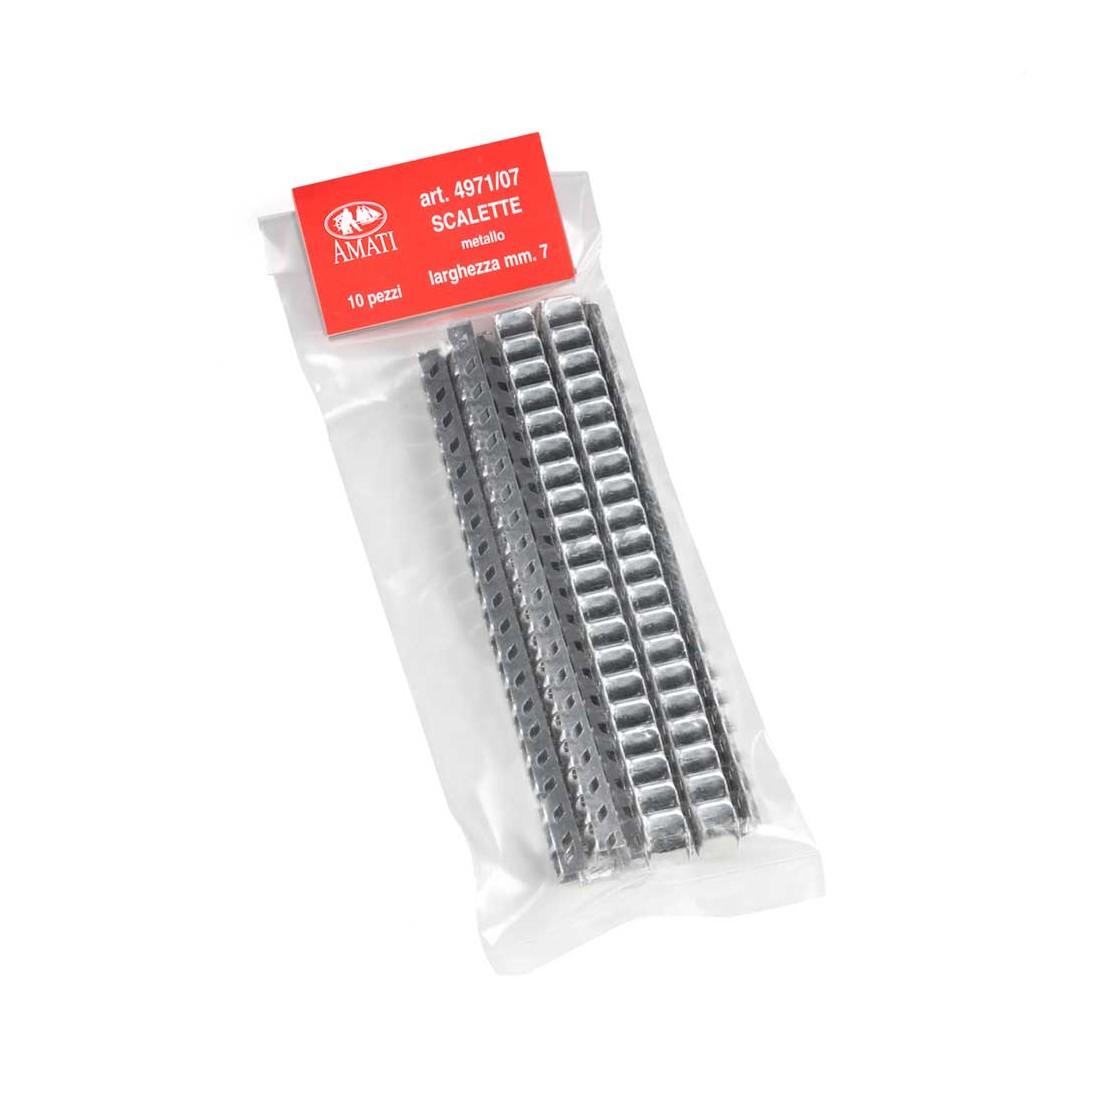 Escaleras de metal mm.7x100.